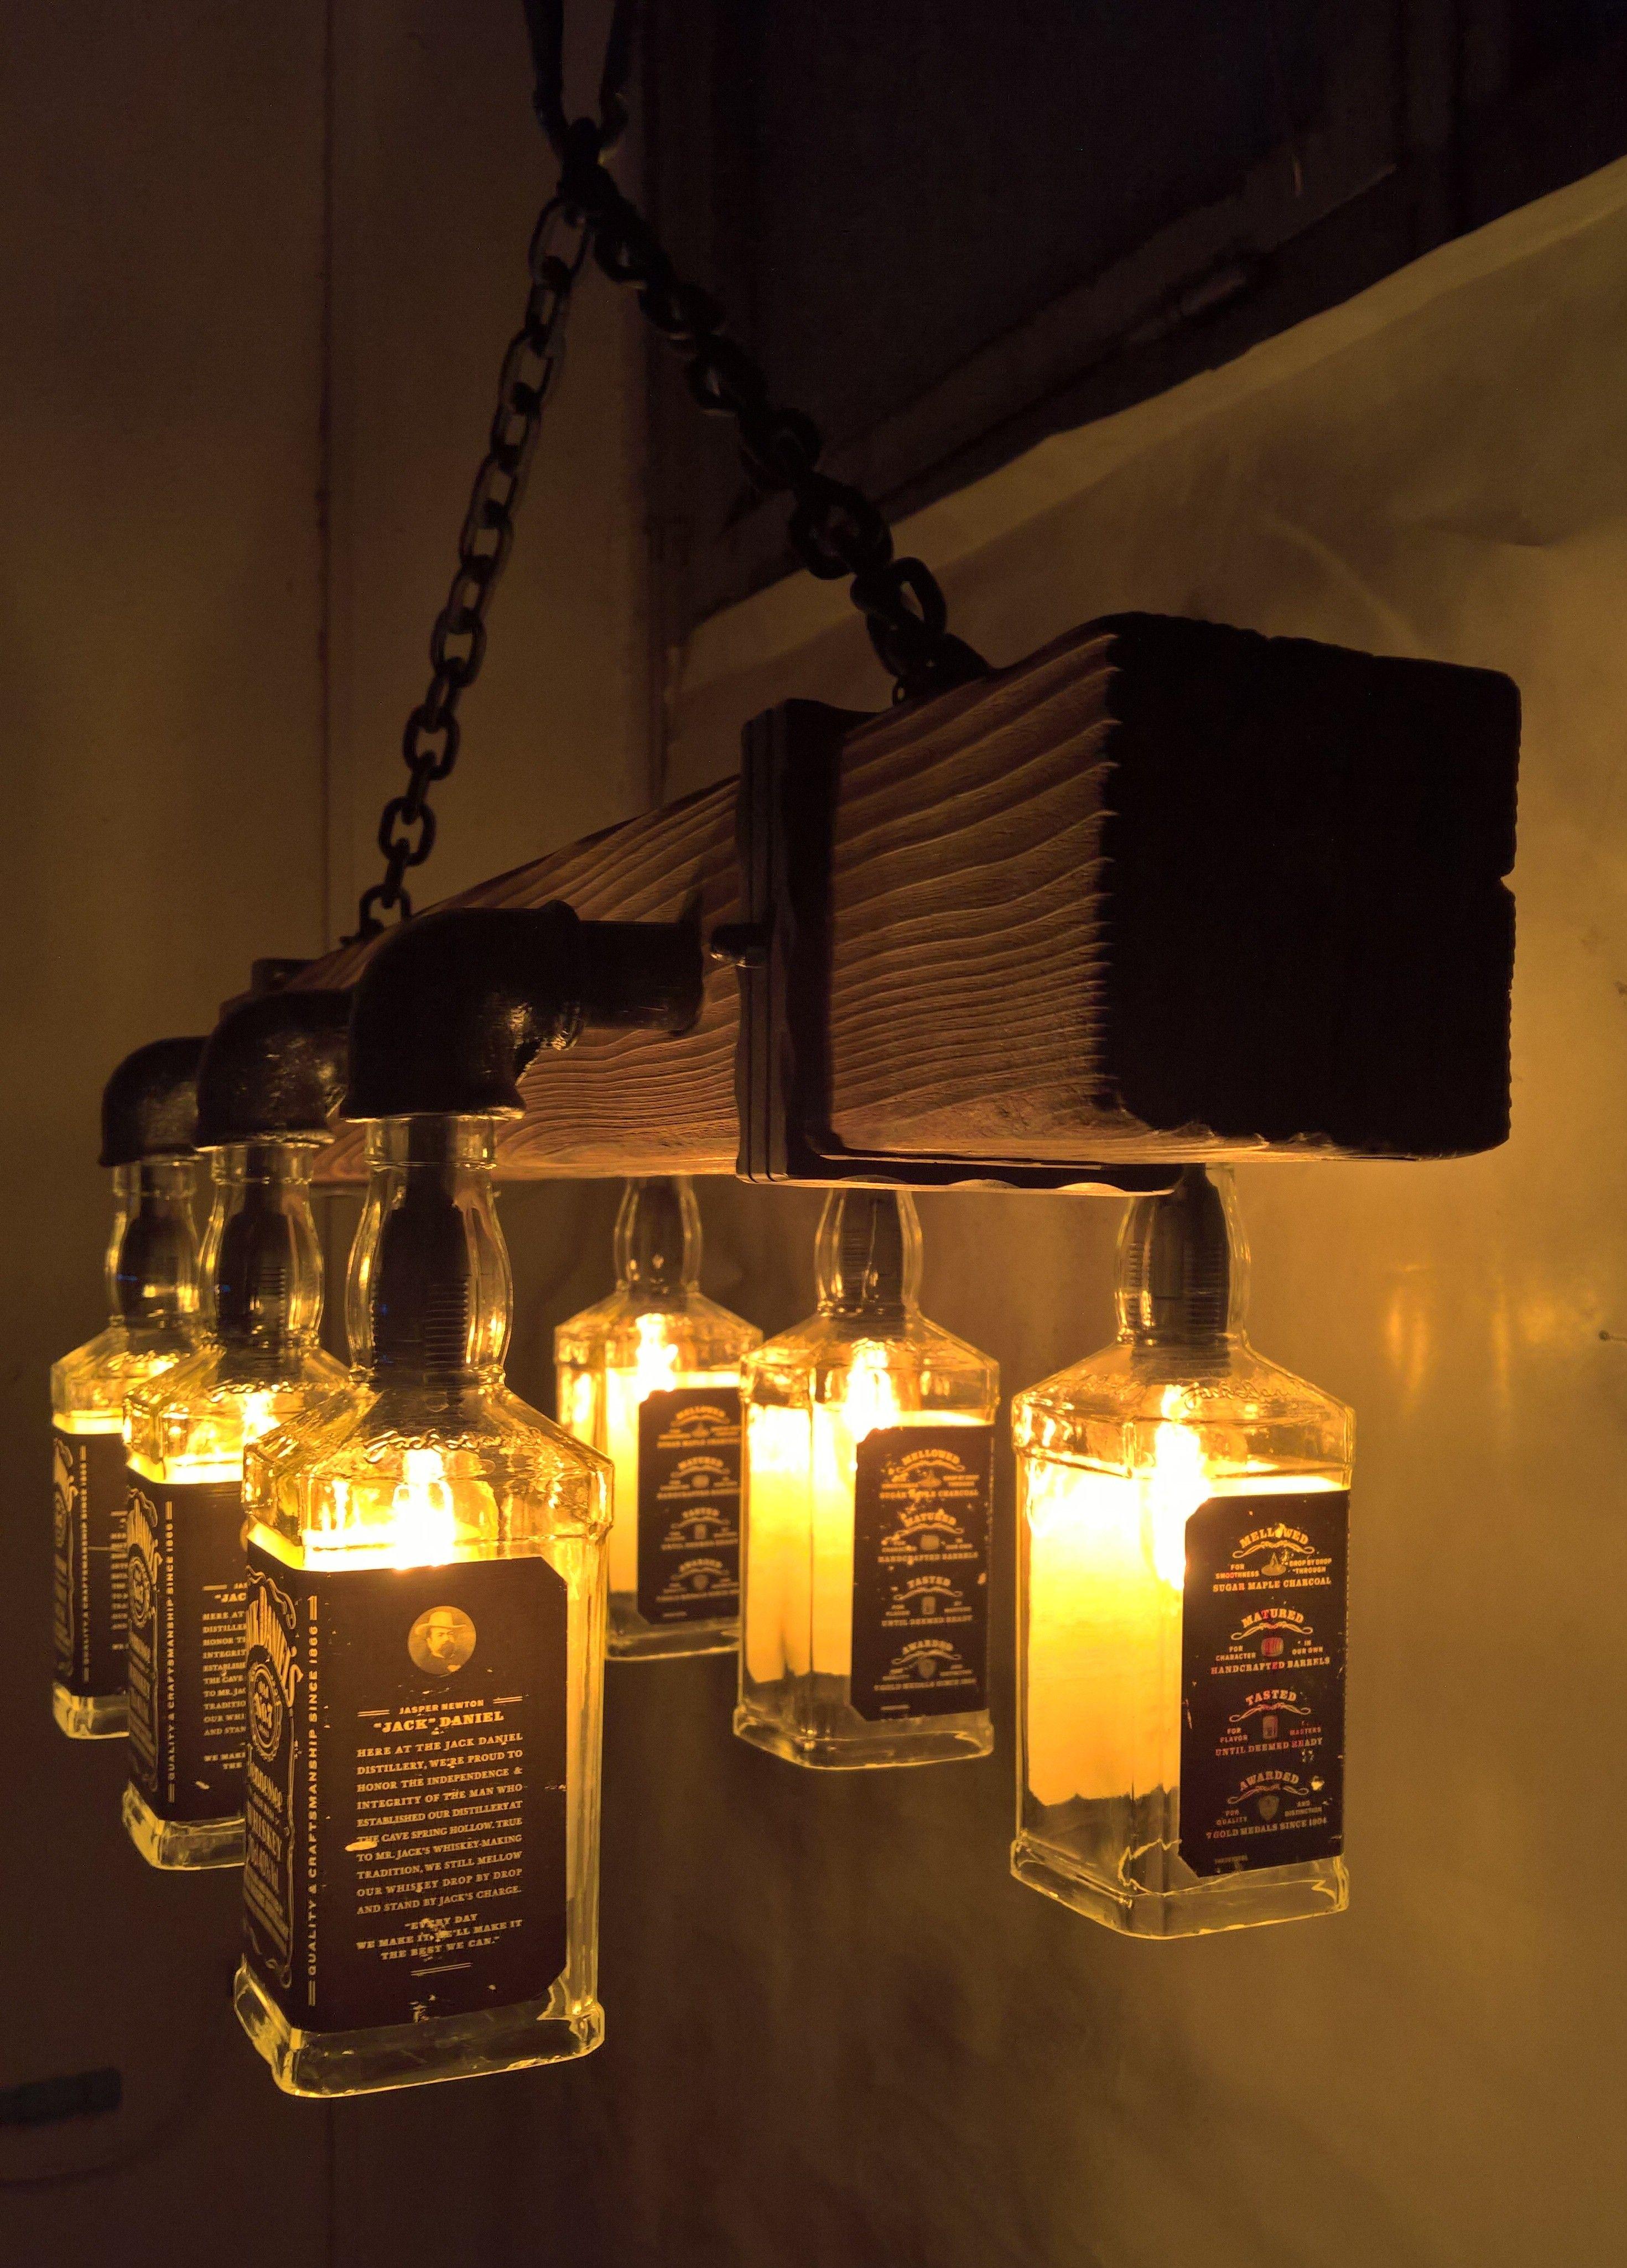 imelgarage Jack daniels lamp   Jack daniels lamp, Bottle ...